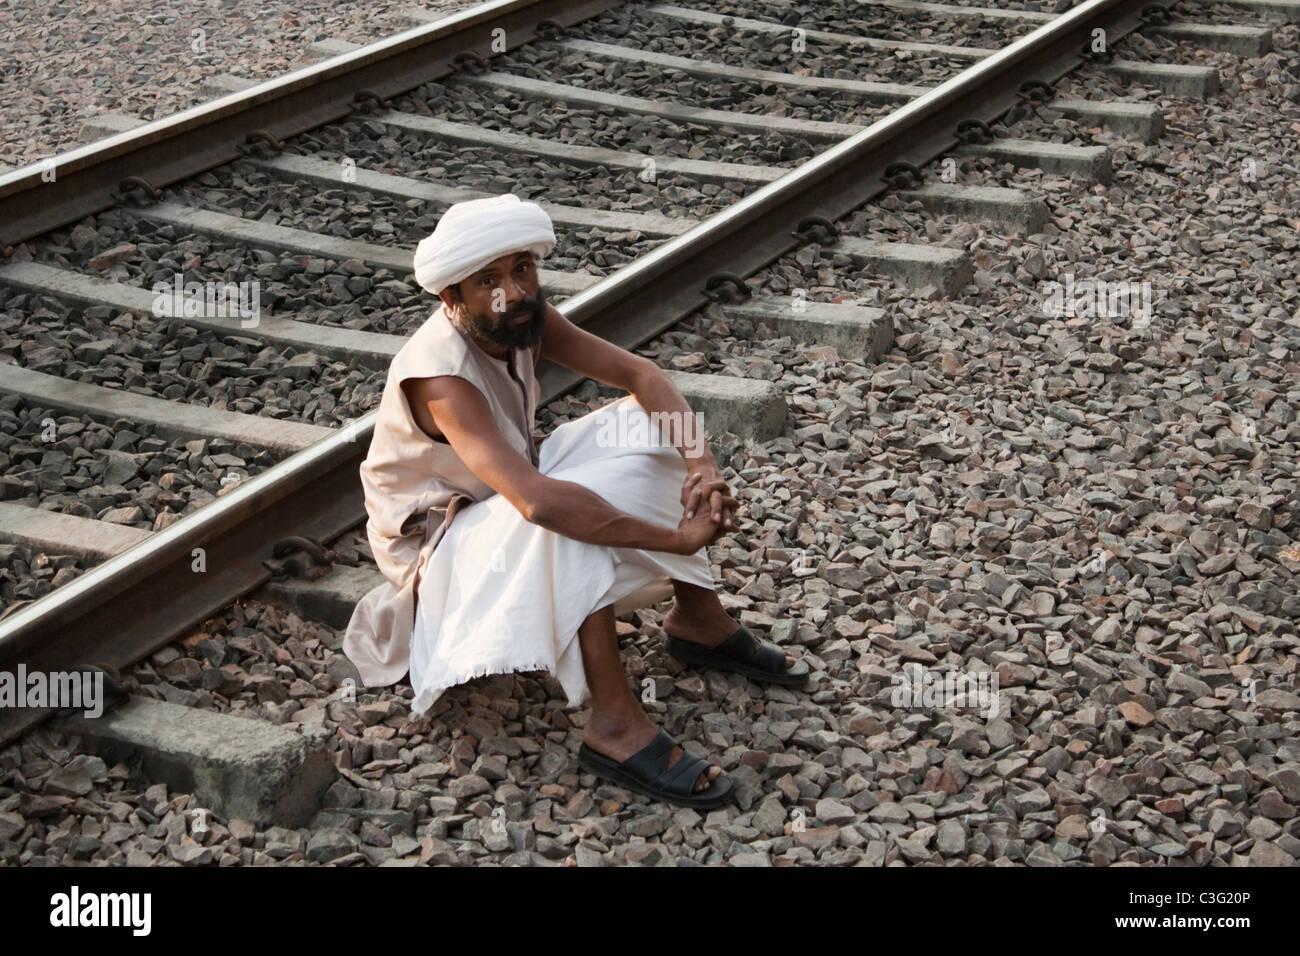 Man sitting near railroad tracks, Ahmedabad, Gujarat, India - Stock Image